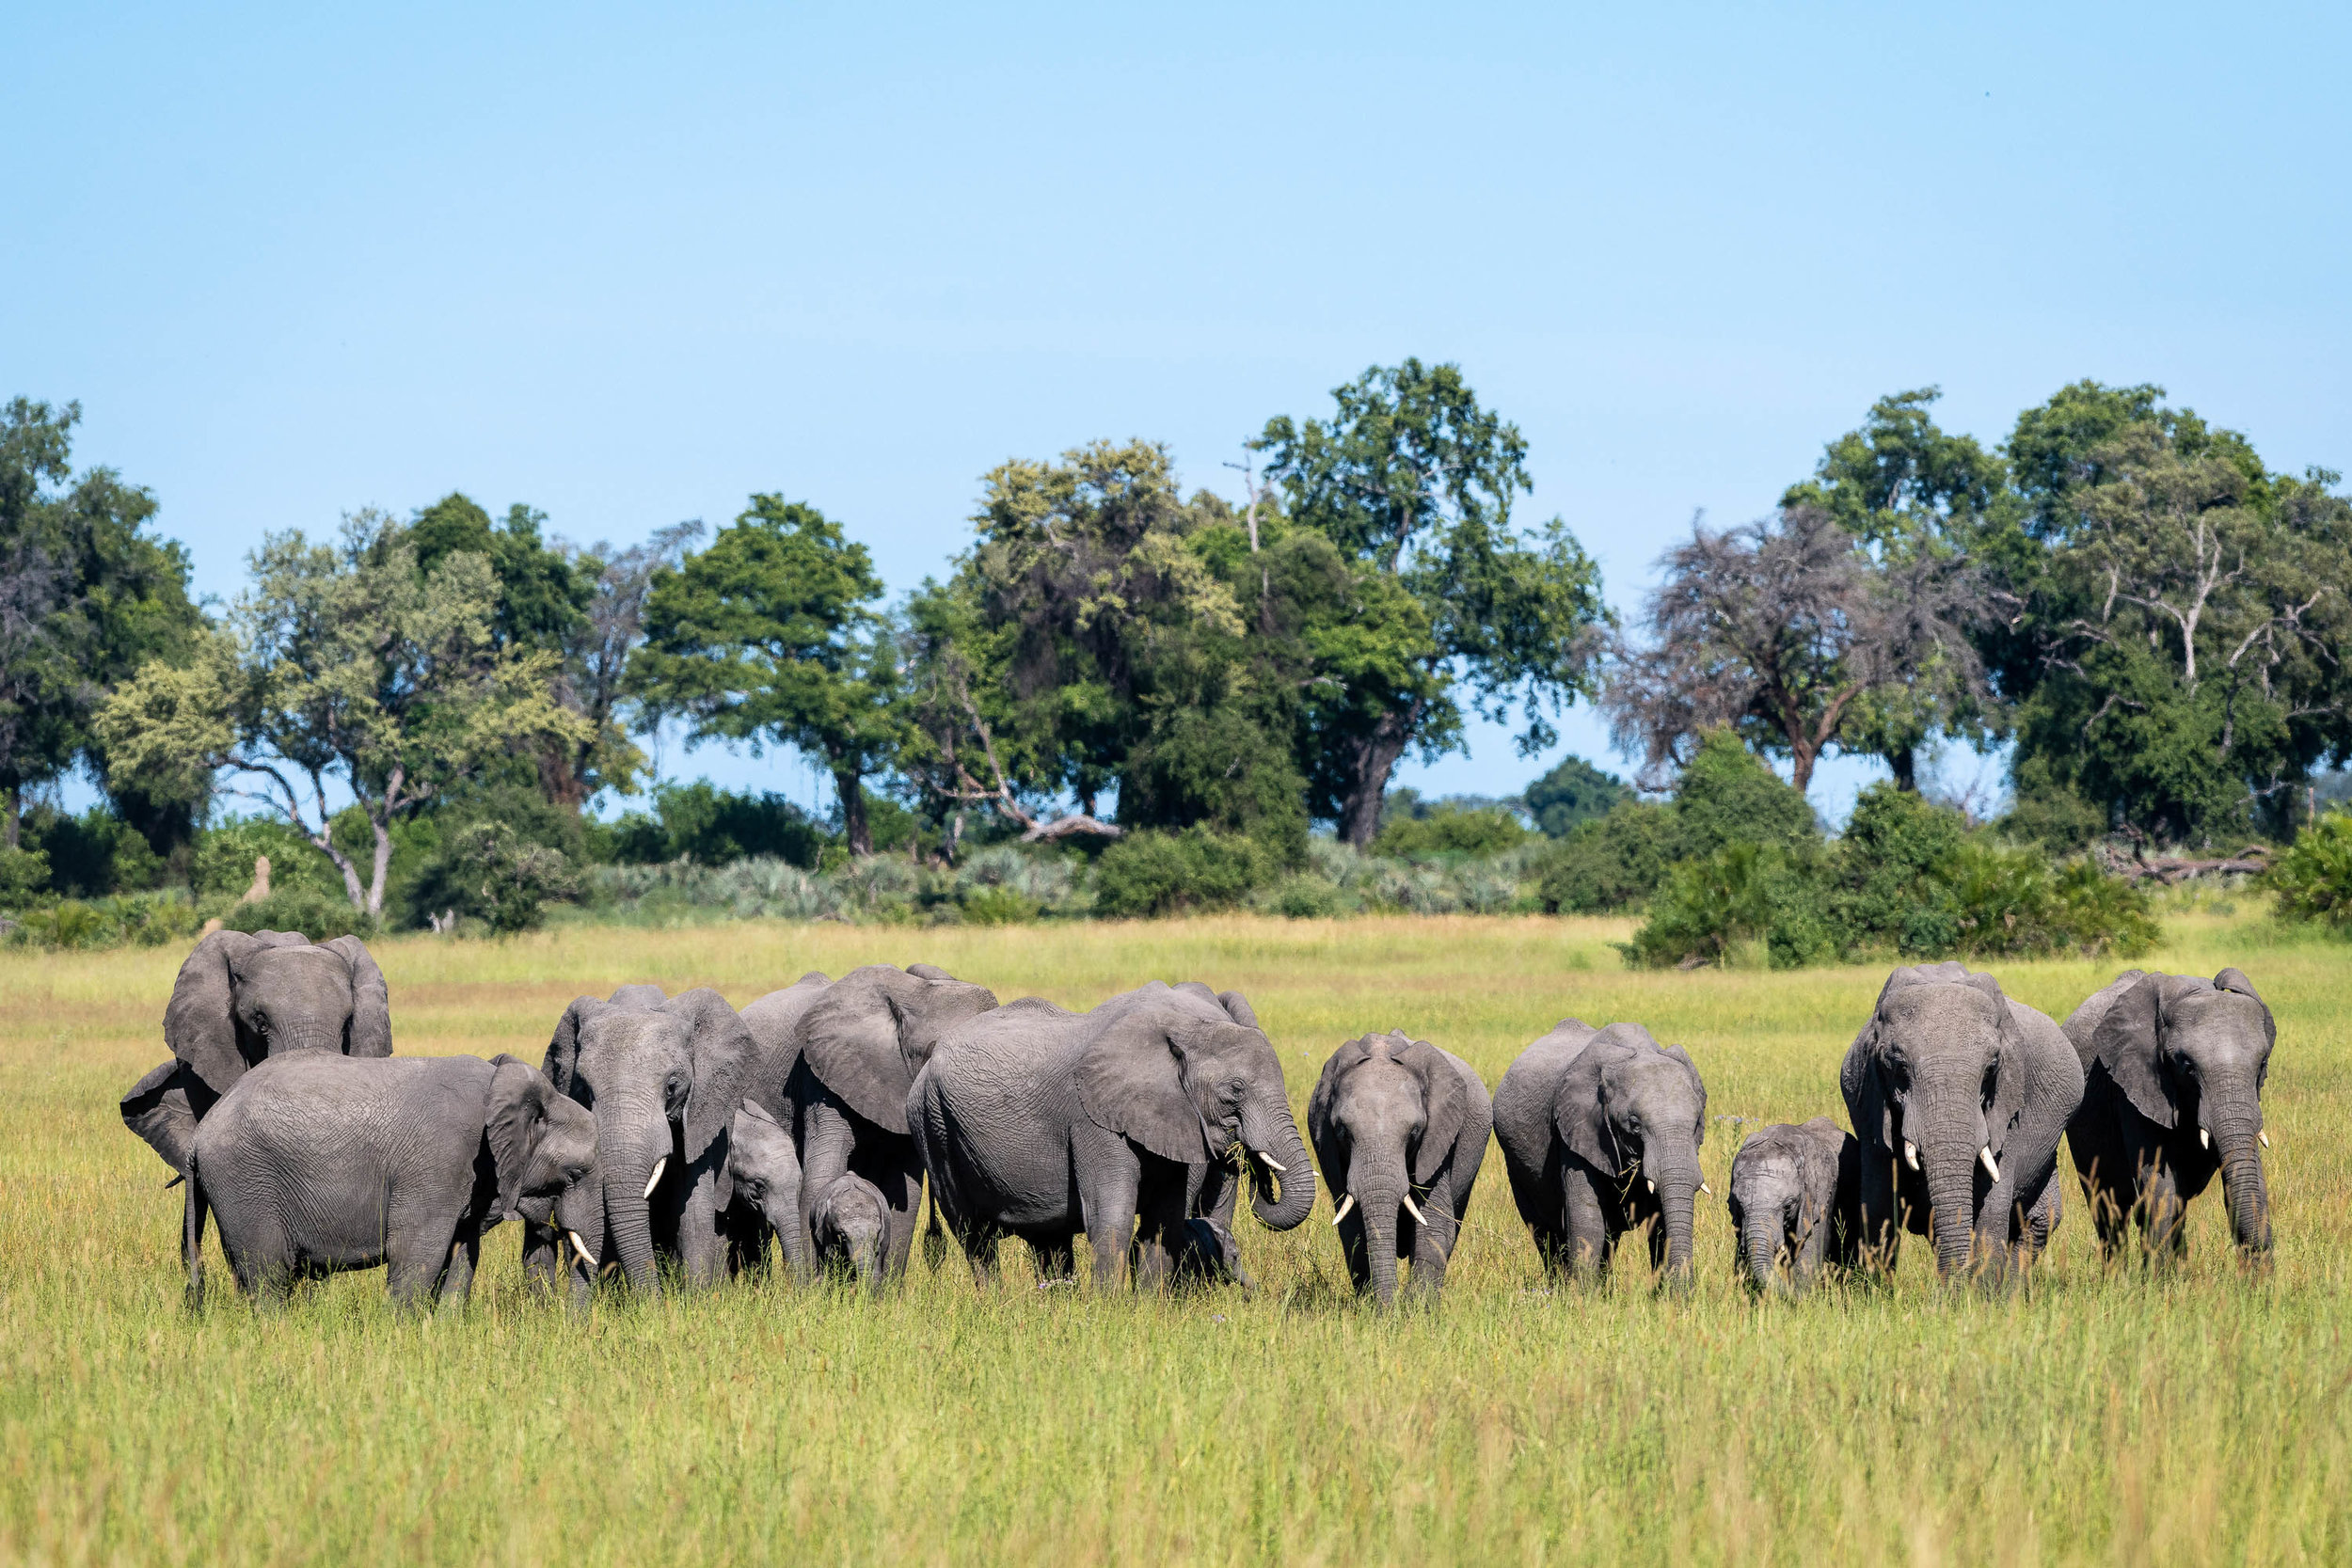 Elephants at Jao Camp, Botswana. Image via  LVCreation.com